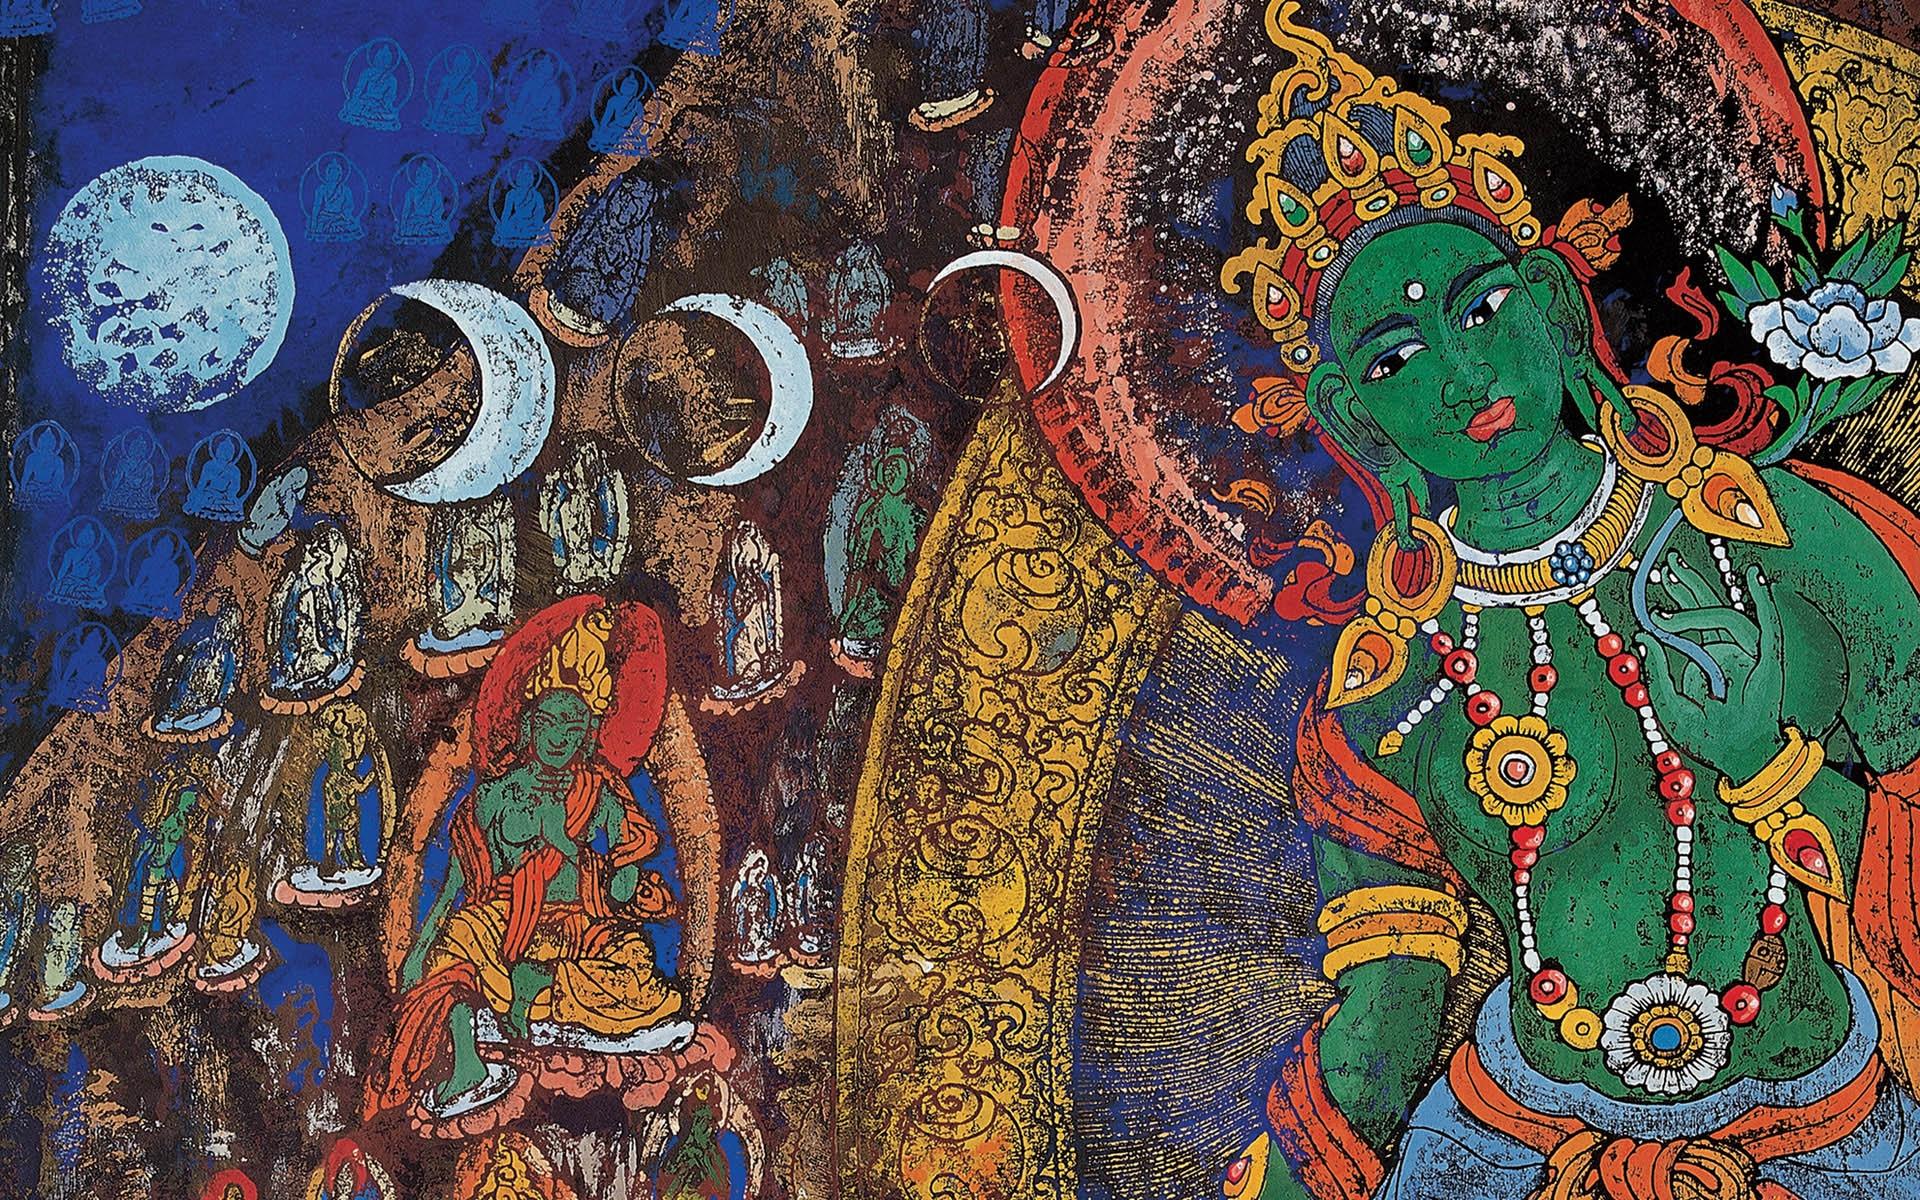 Wall Painting Of Buddha